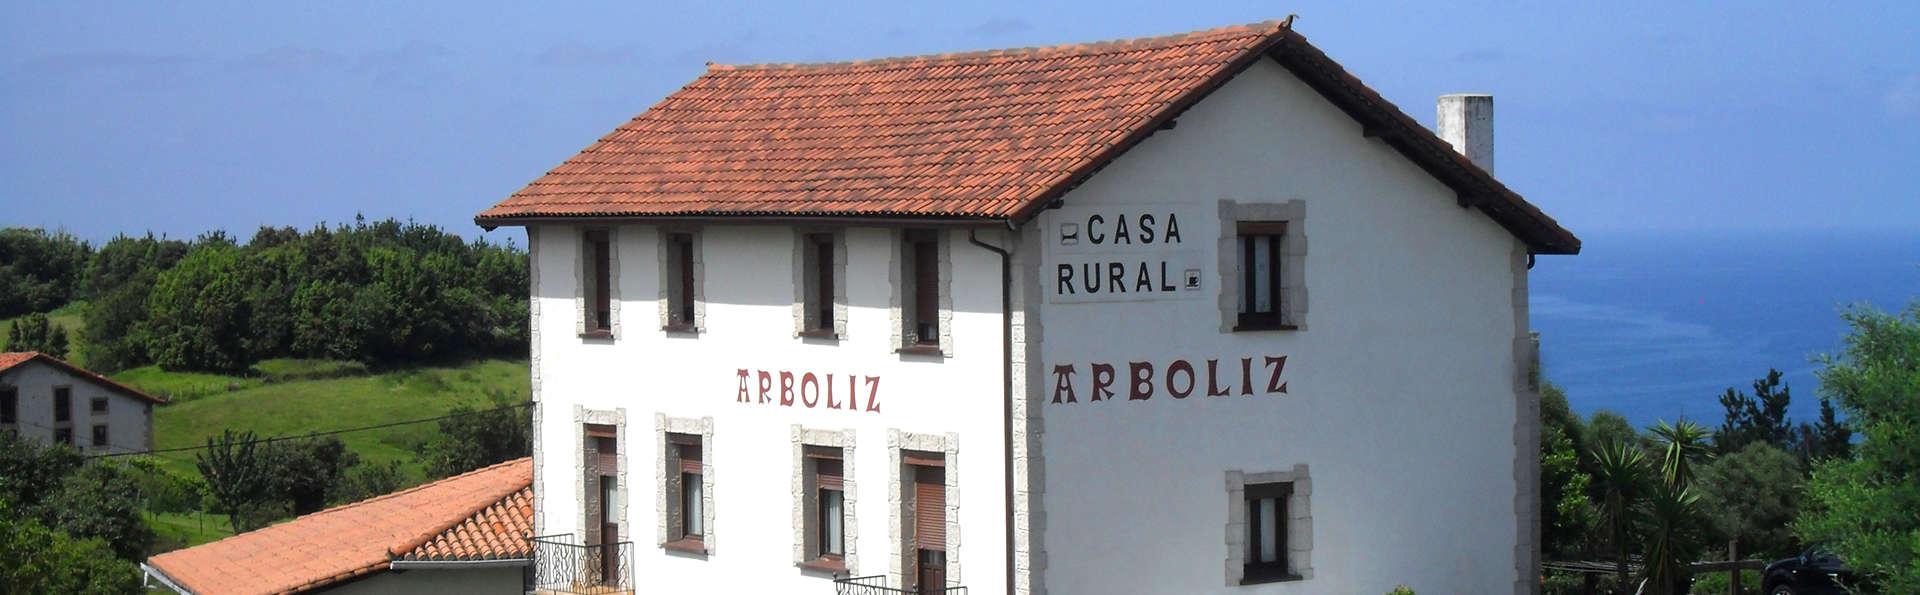 Casa Rural Arboliz - EDIT_Exterior2.jpg